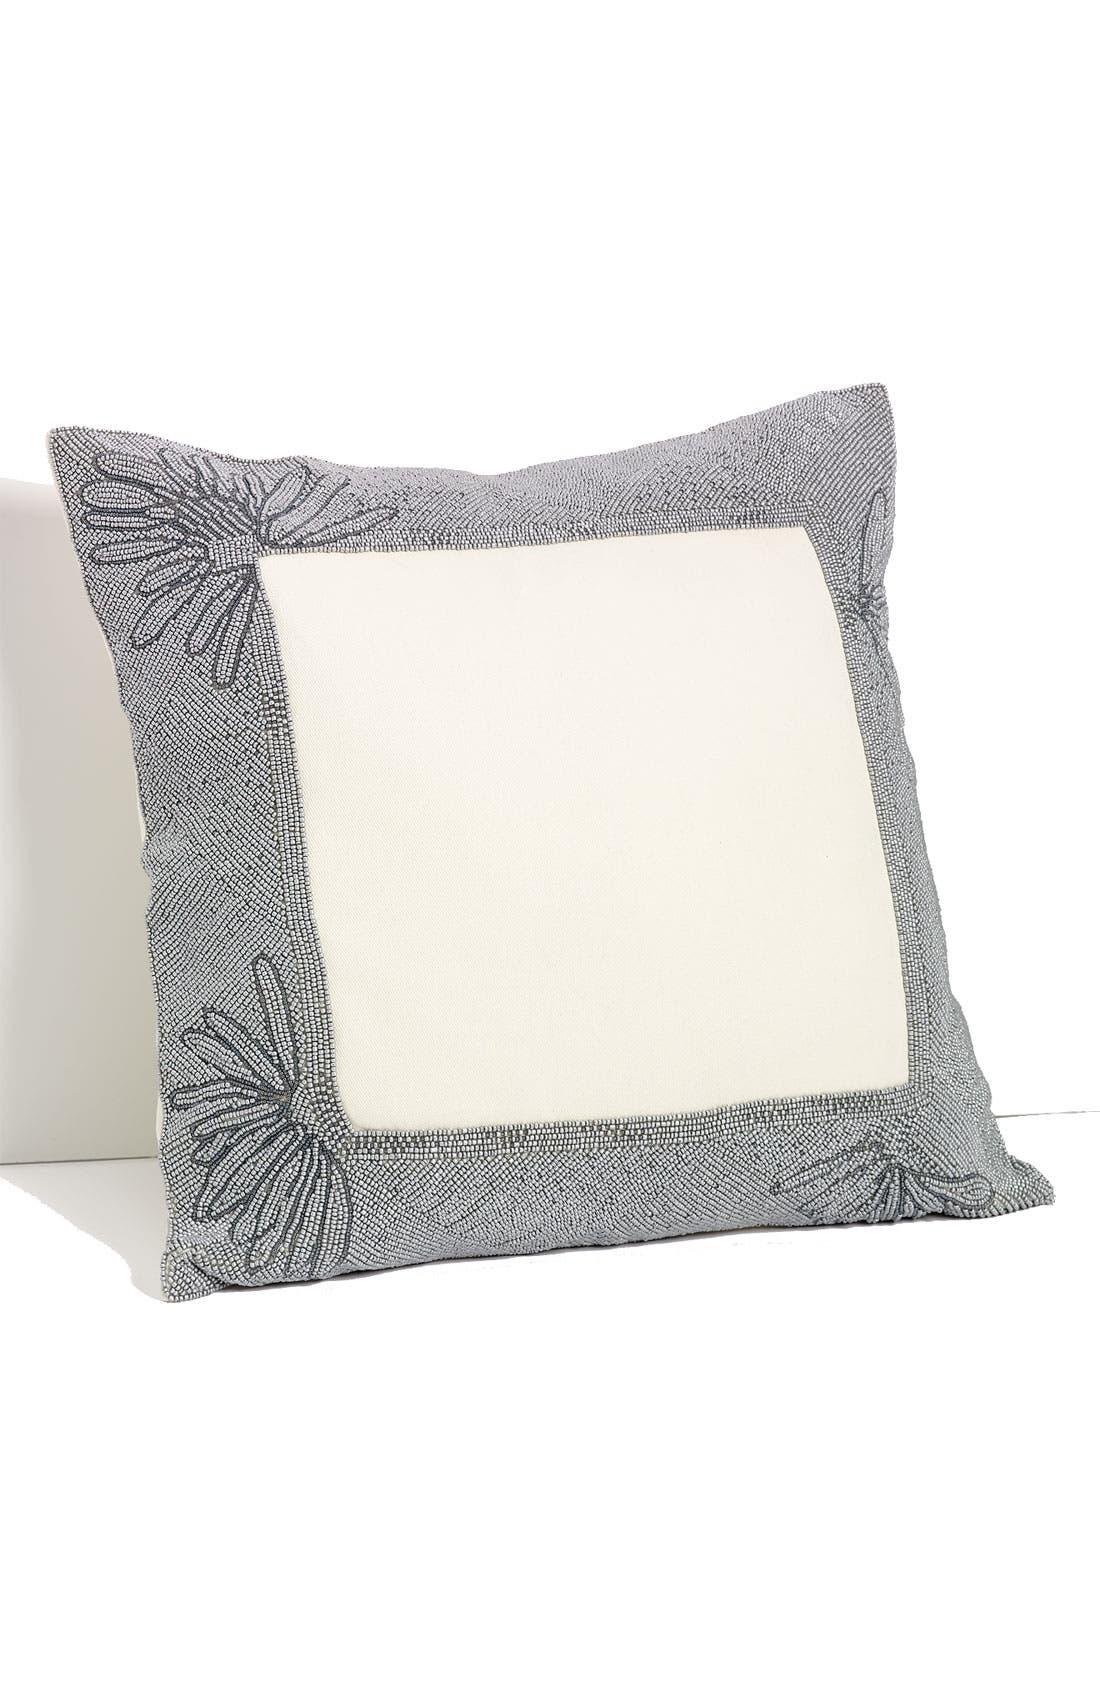 Main Image - Diane von Furstenberg 'Beaded Border' Pillow